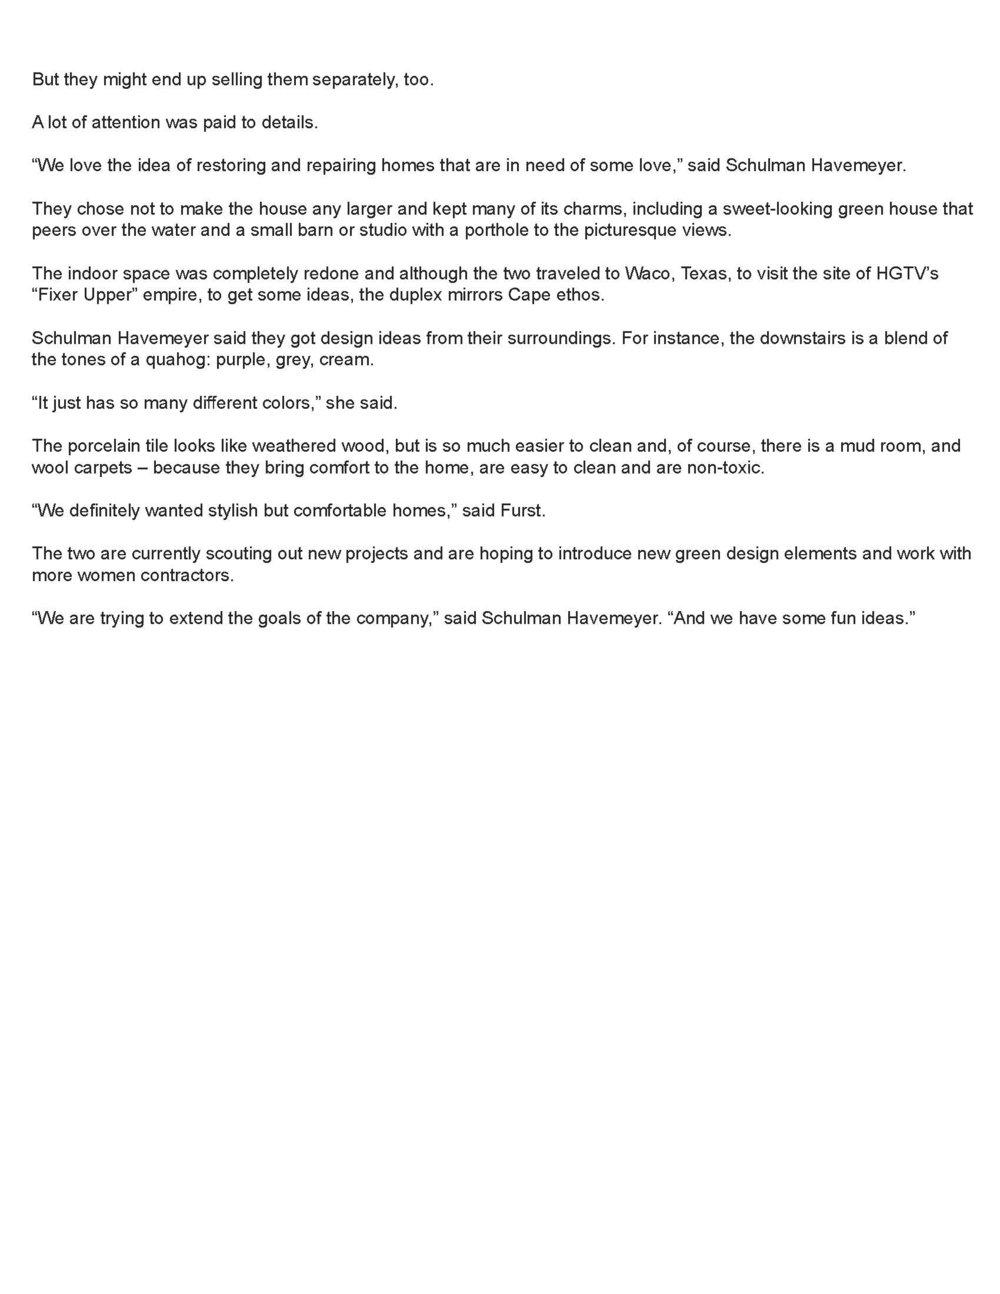 Beach Plum Props-Cape Codder.2(1)_Page_2.jpg